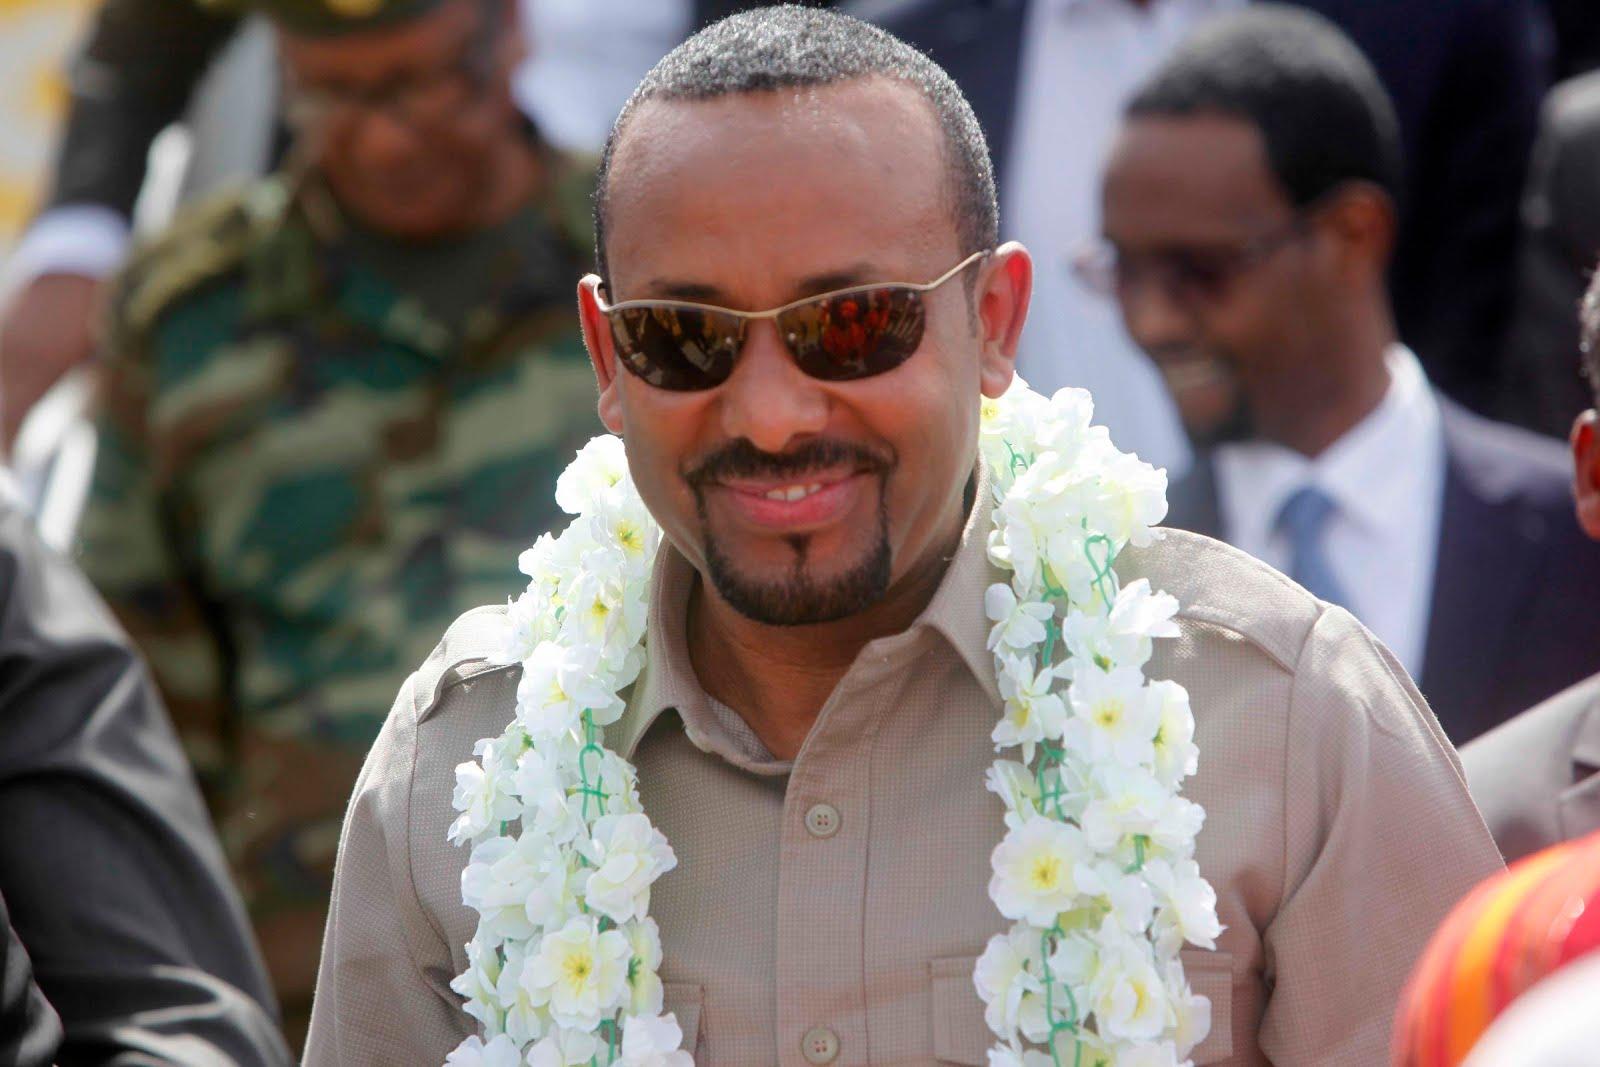 http://3.bp.blogspot.com/-izFgGlVOFHY/WzdGAh6PRtI/AAAAAAAAcXY/bikgAyQLjQsykjtHu1-IY0Eh5T-j2origCK4BGAYYCw/s1600/abiy-ahmed-ethiopia.jpg